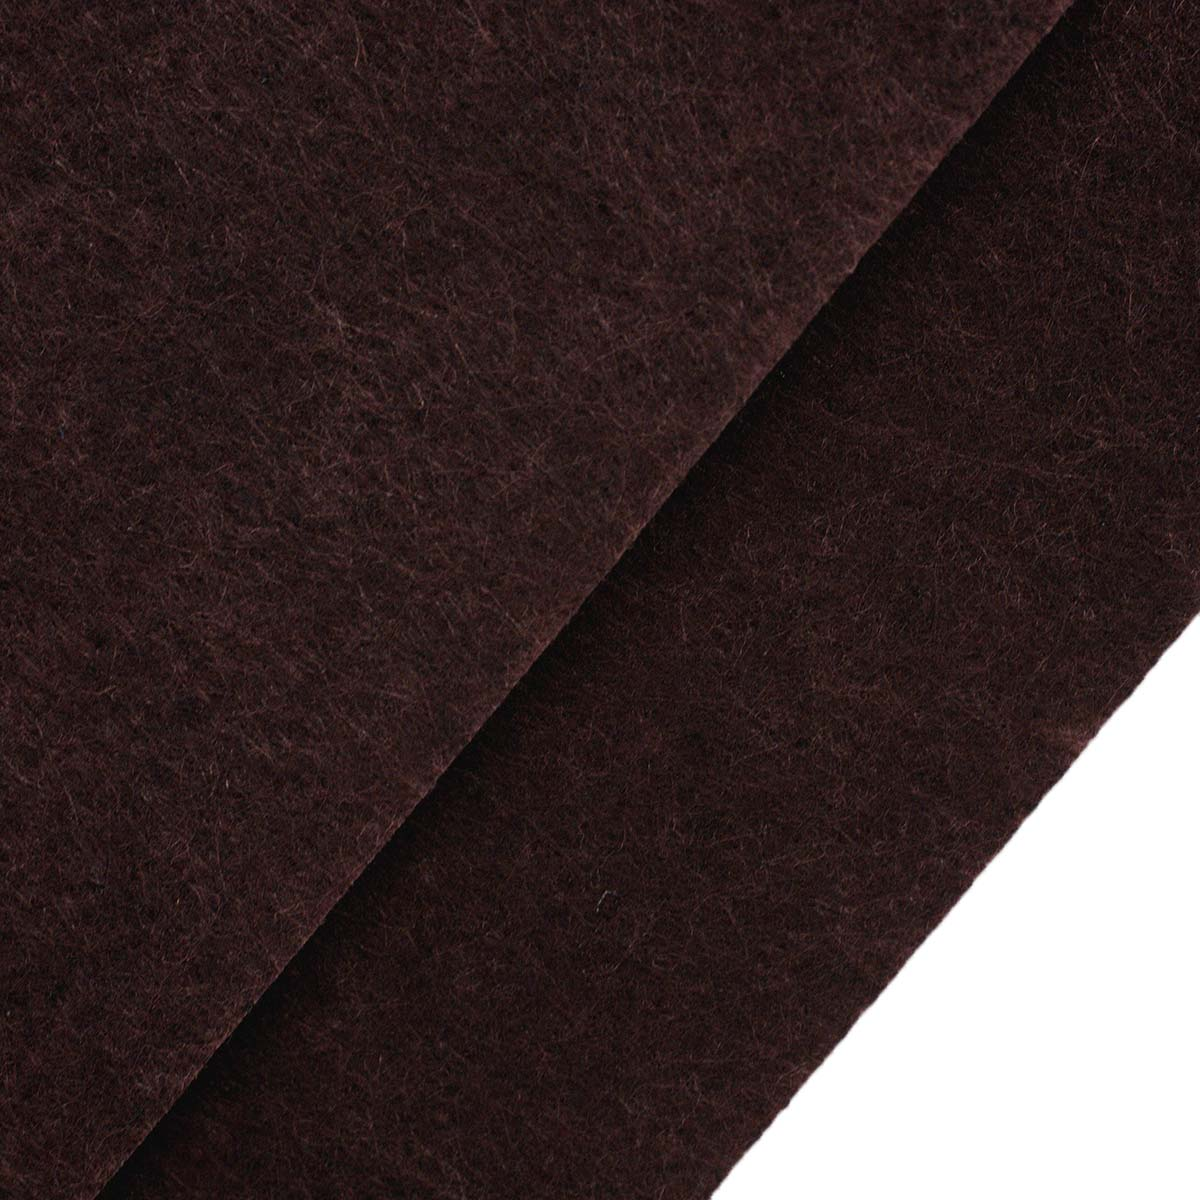 26960 Фетр жёсткий 1,0мм, 20*30 см, 100 % п/э, уп/2шт, т.коричневый